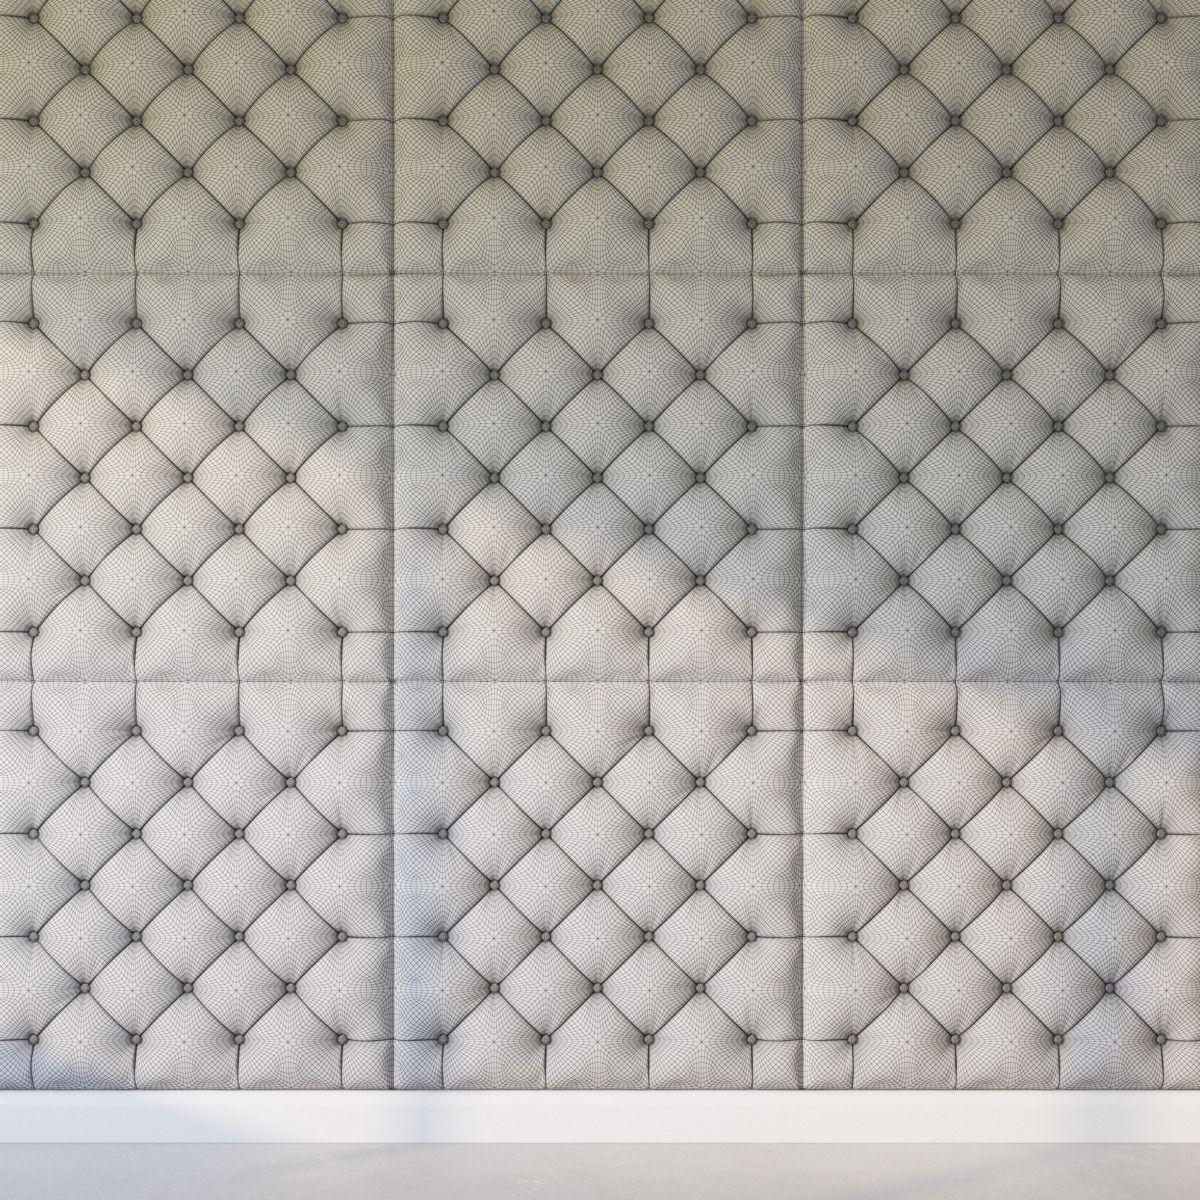 Panel Lights: Decorative Wall Panel Lights